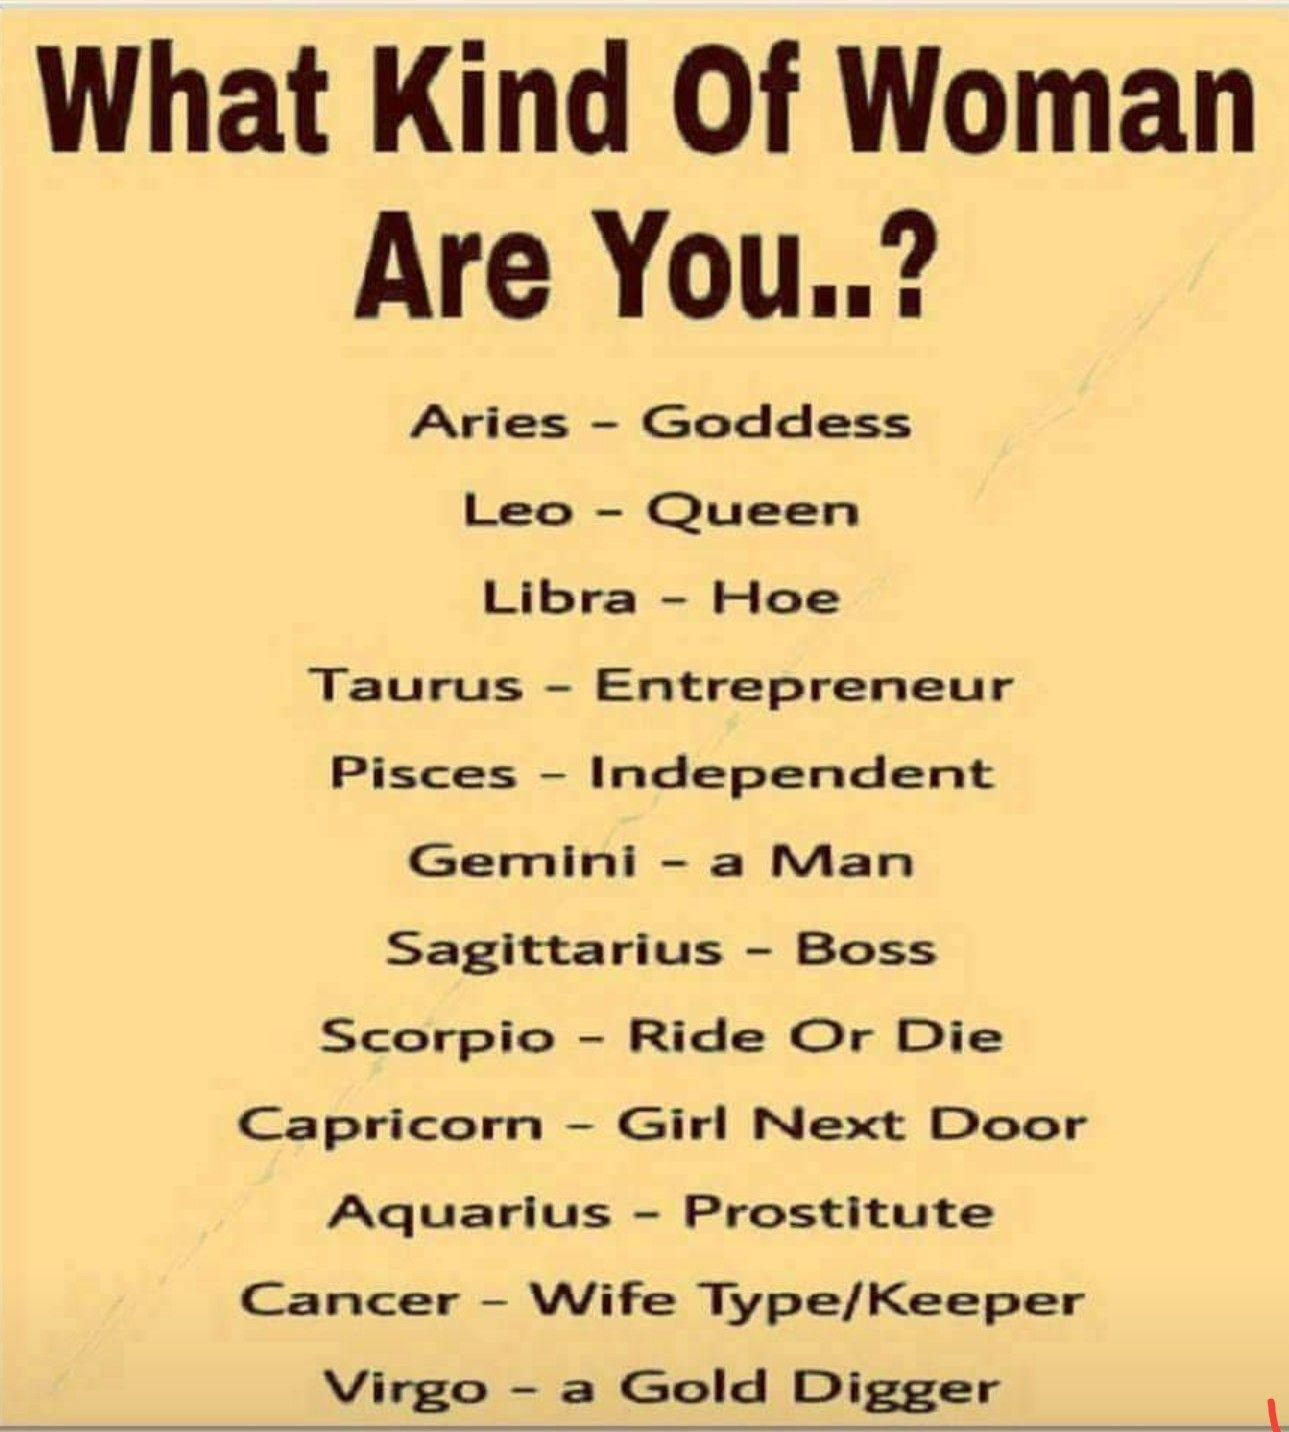 Wife Type/Keeper If u love me I swear I prob love u ten